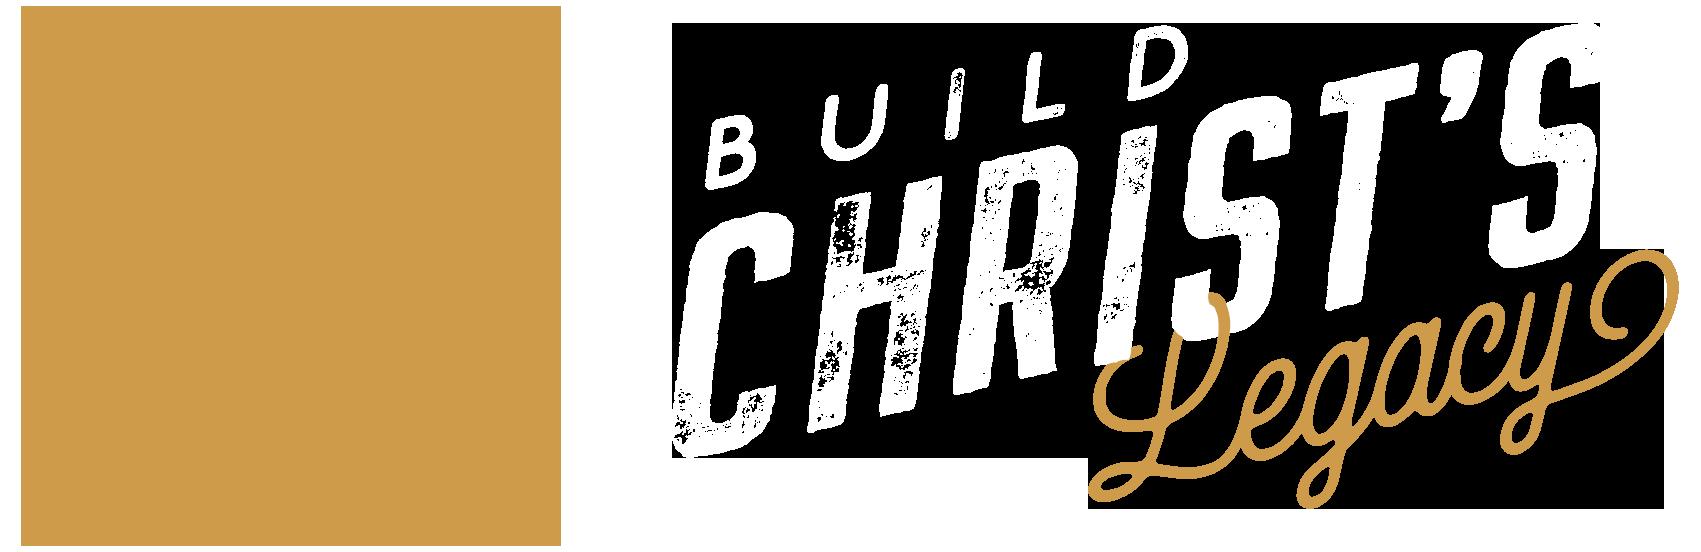 Web-logo-BuildChristsLegacy.png